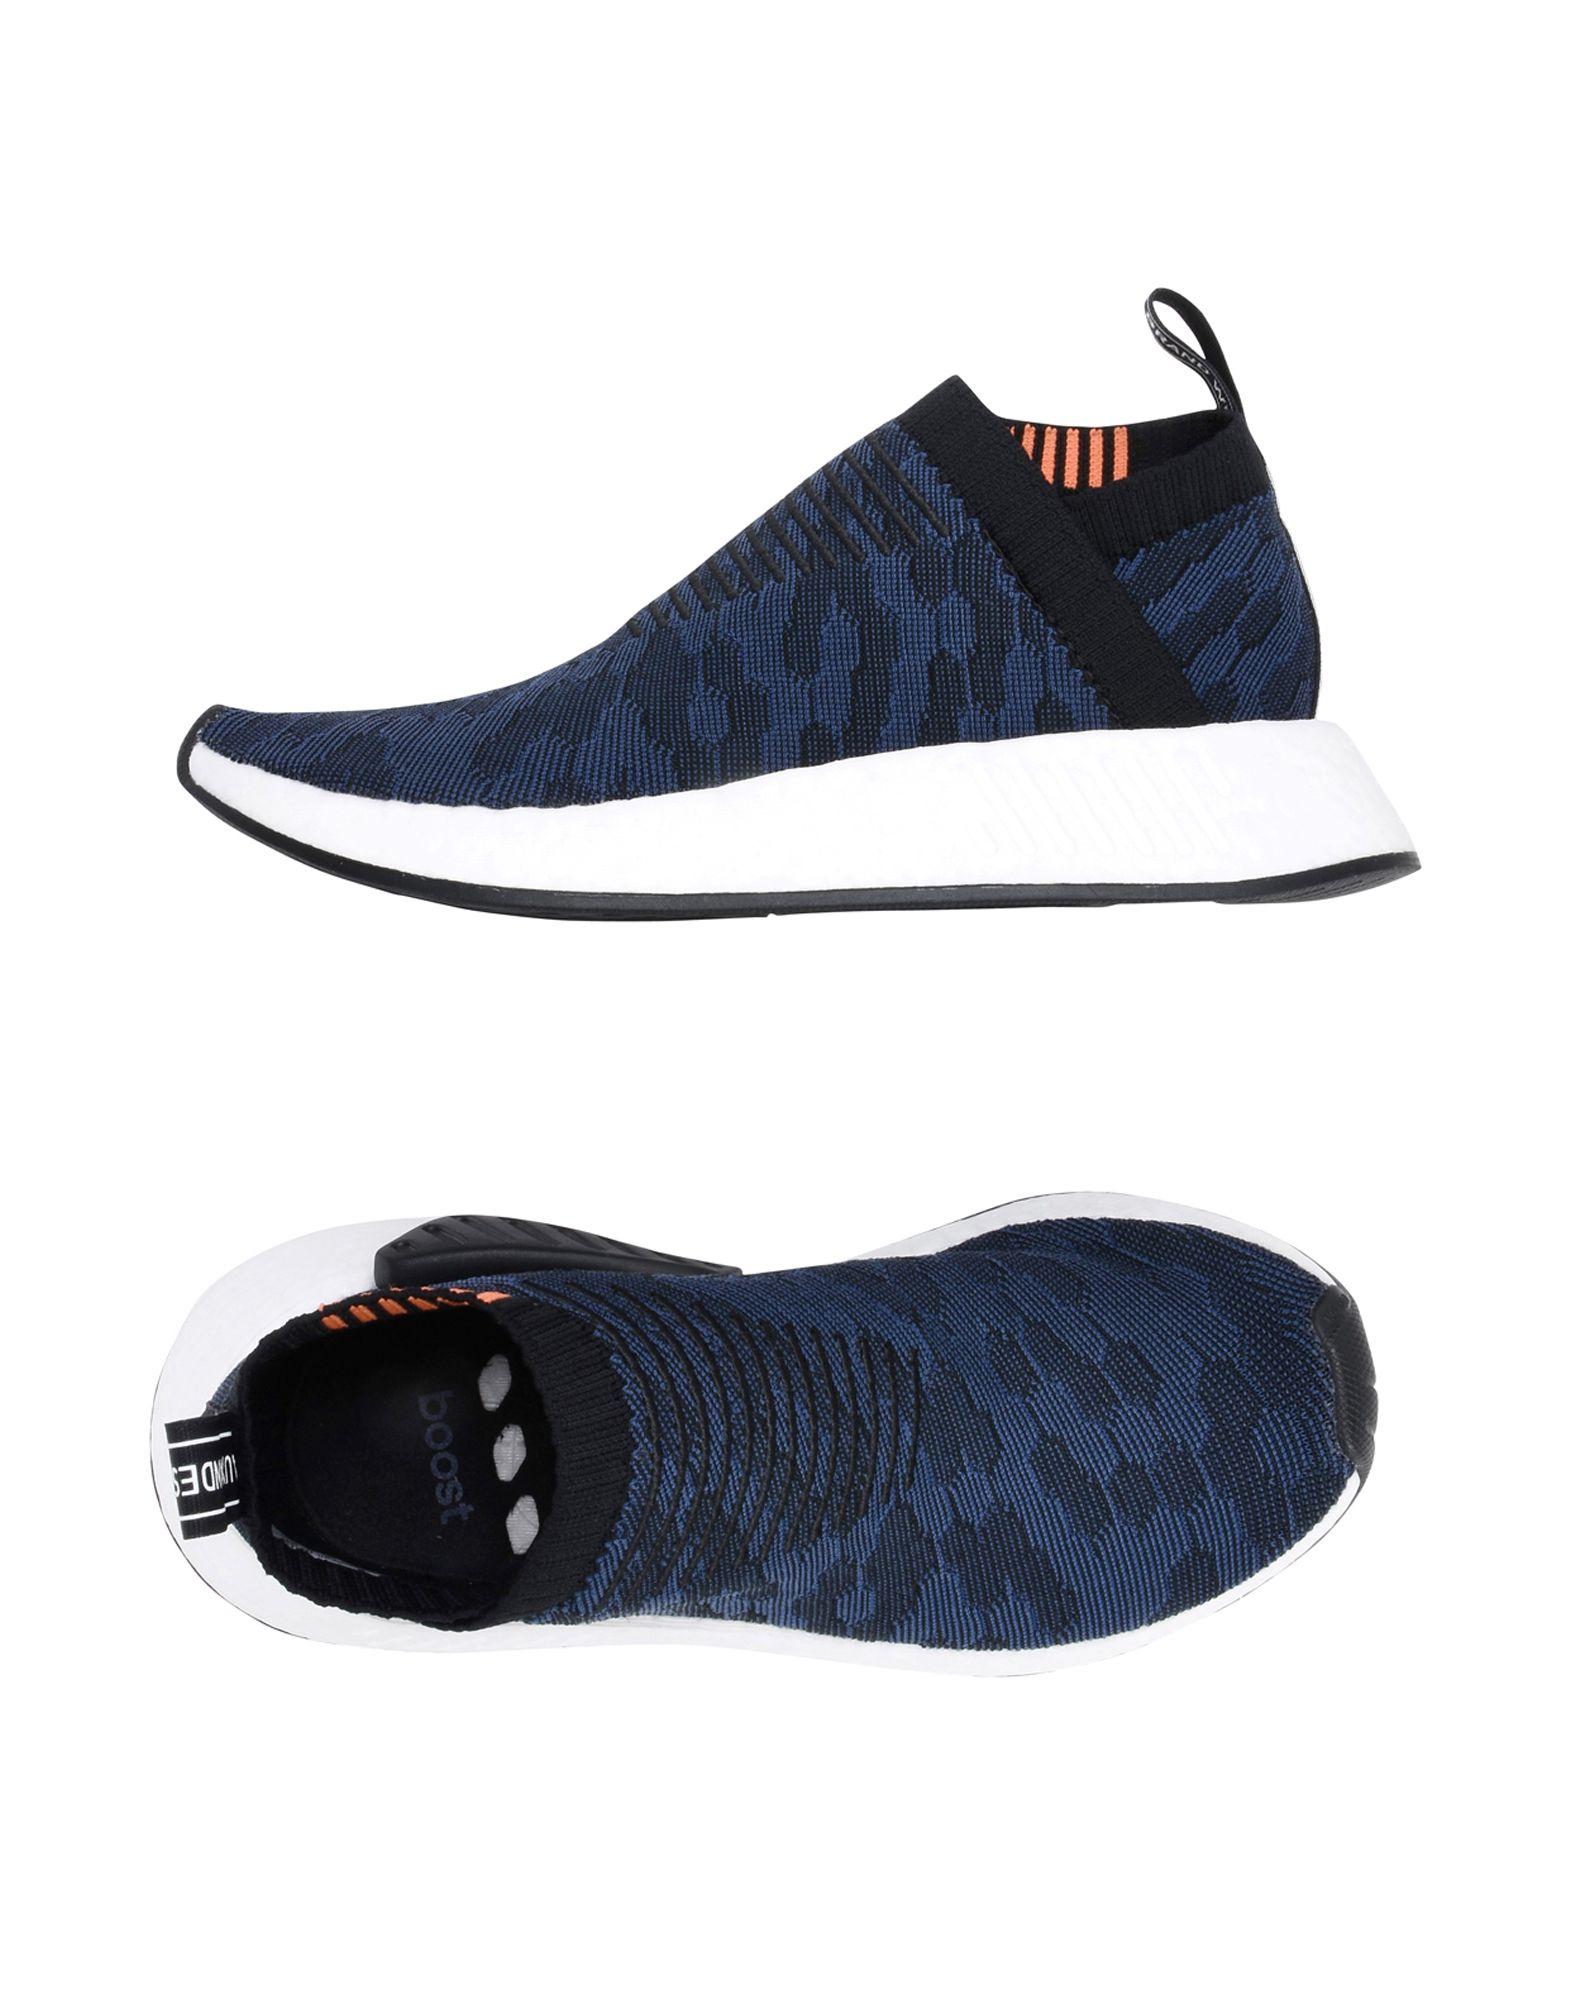 Sneakers Adidas Originals Nmd_Cs2 Pk W - Donna - 11415614HS